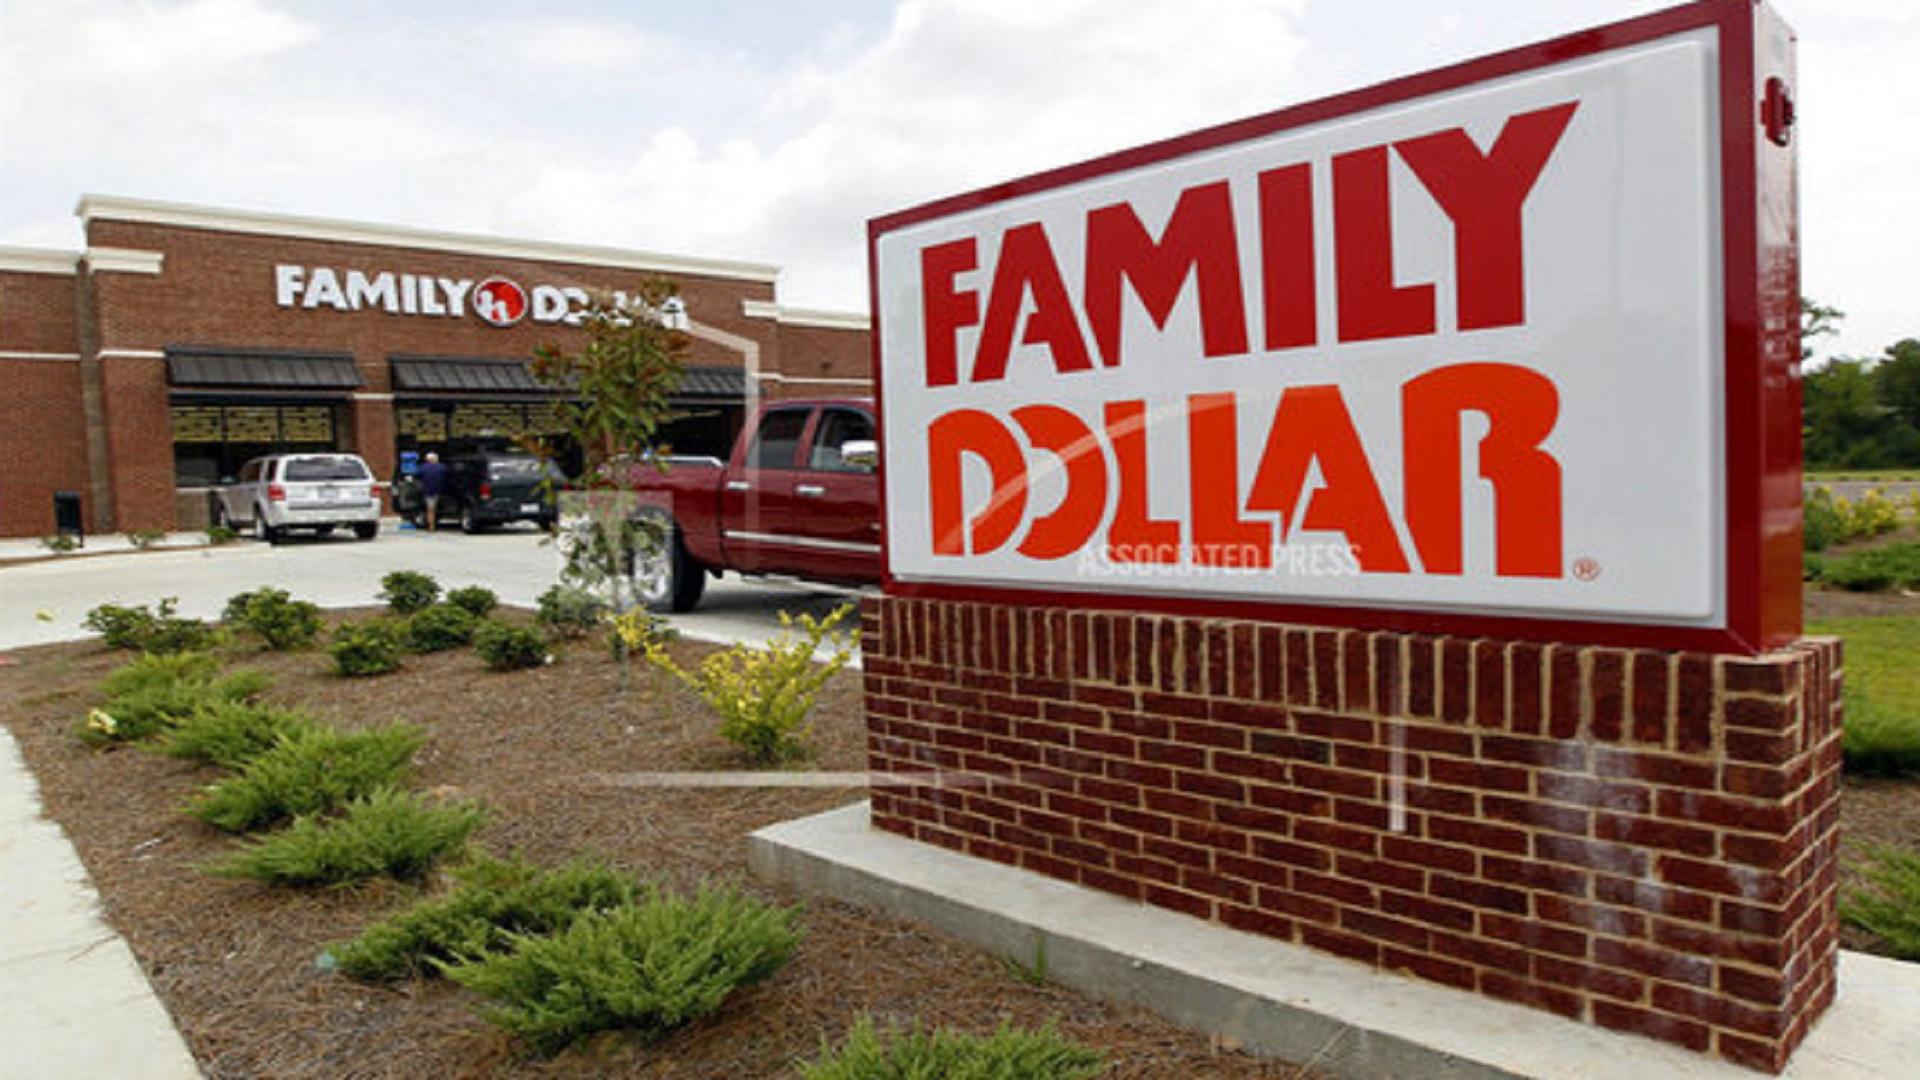 Family Dollar Dollar General_1551905361910